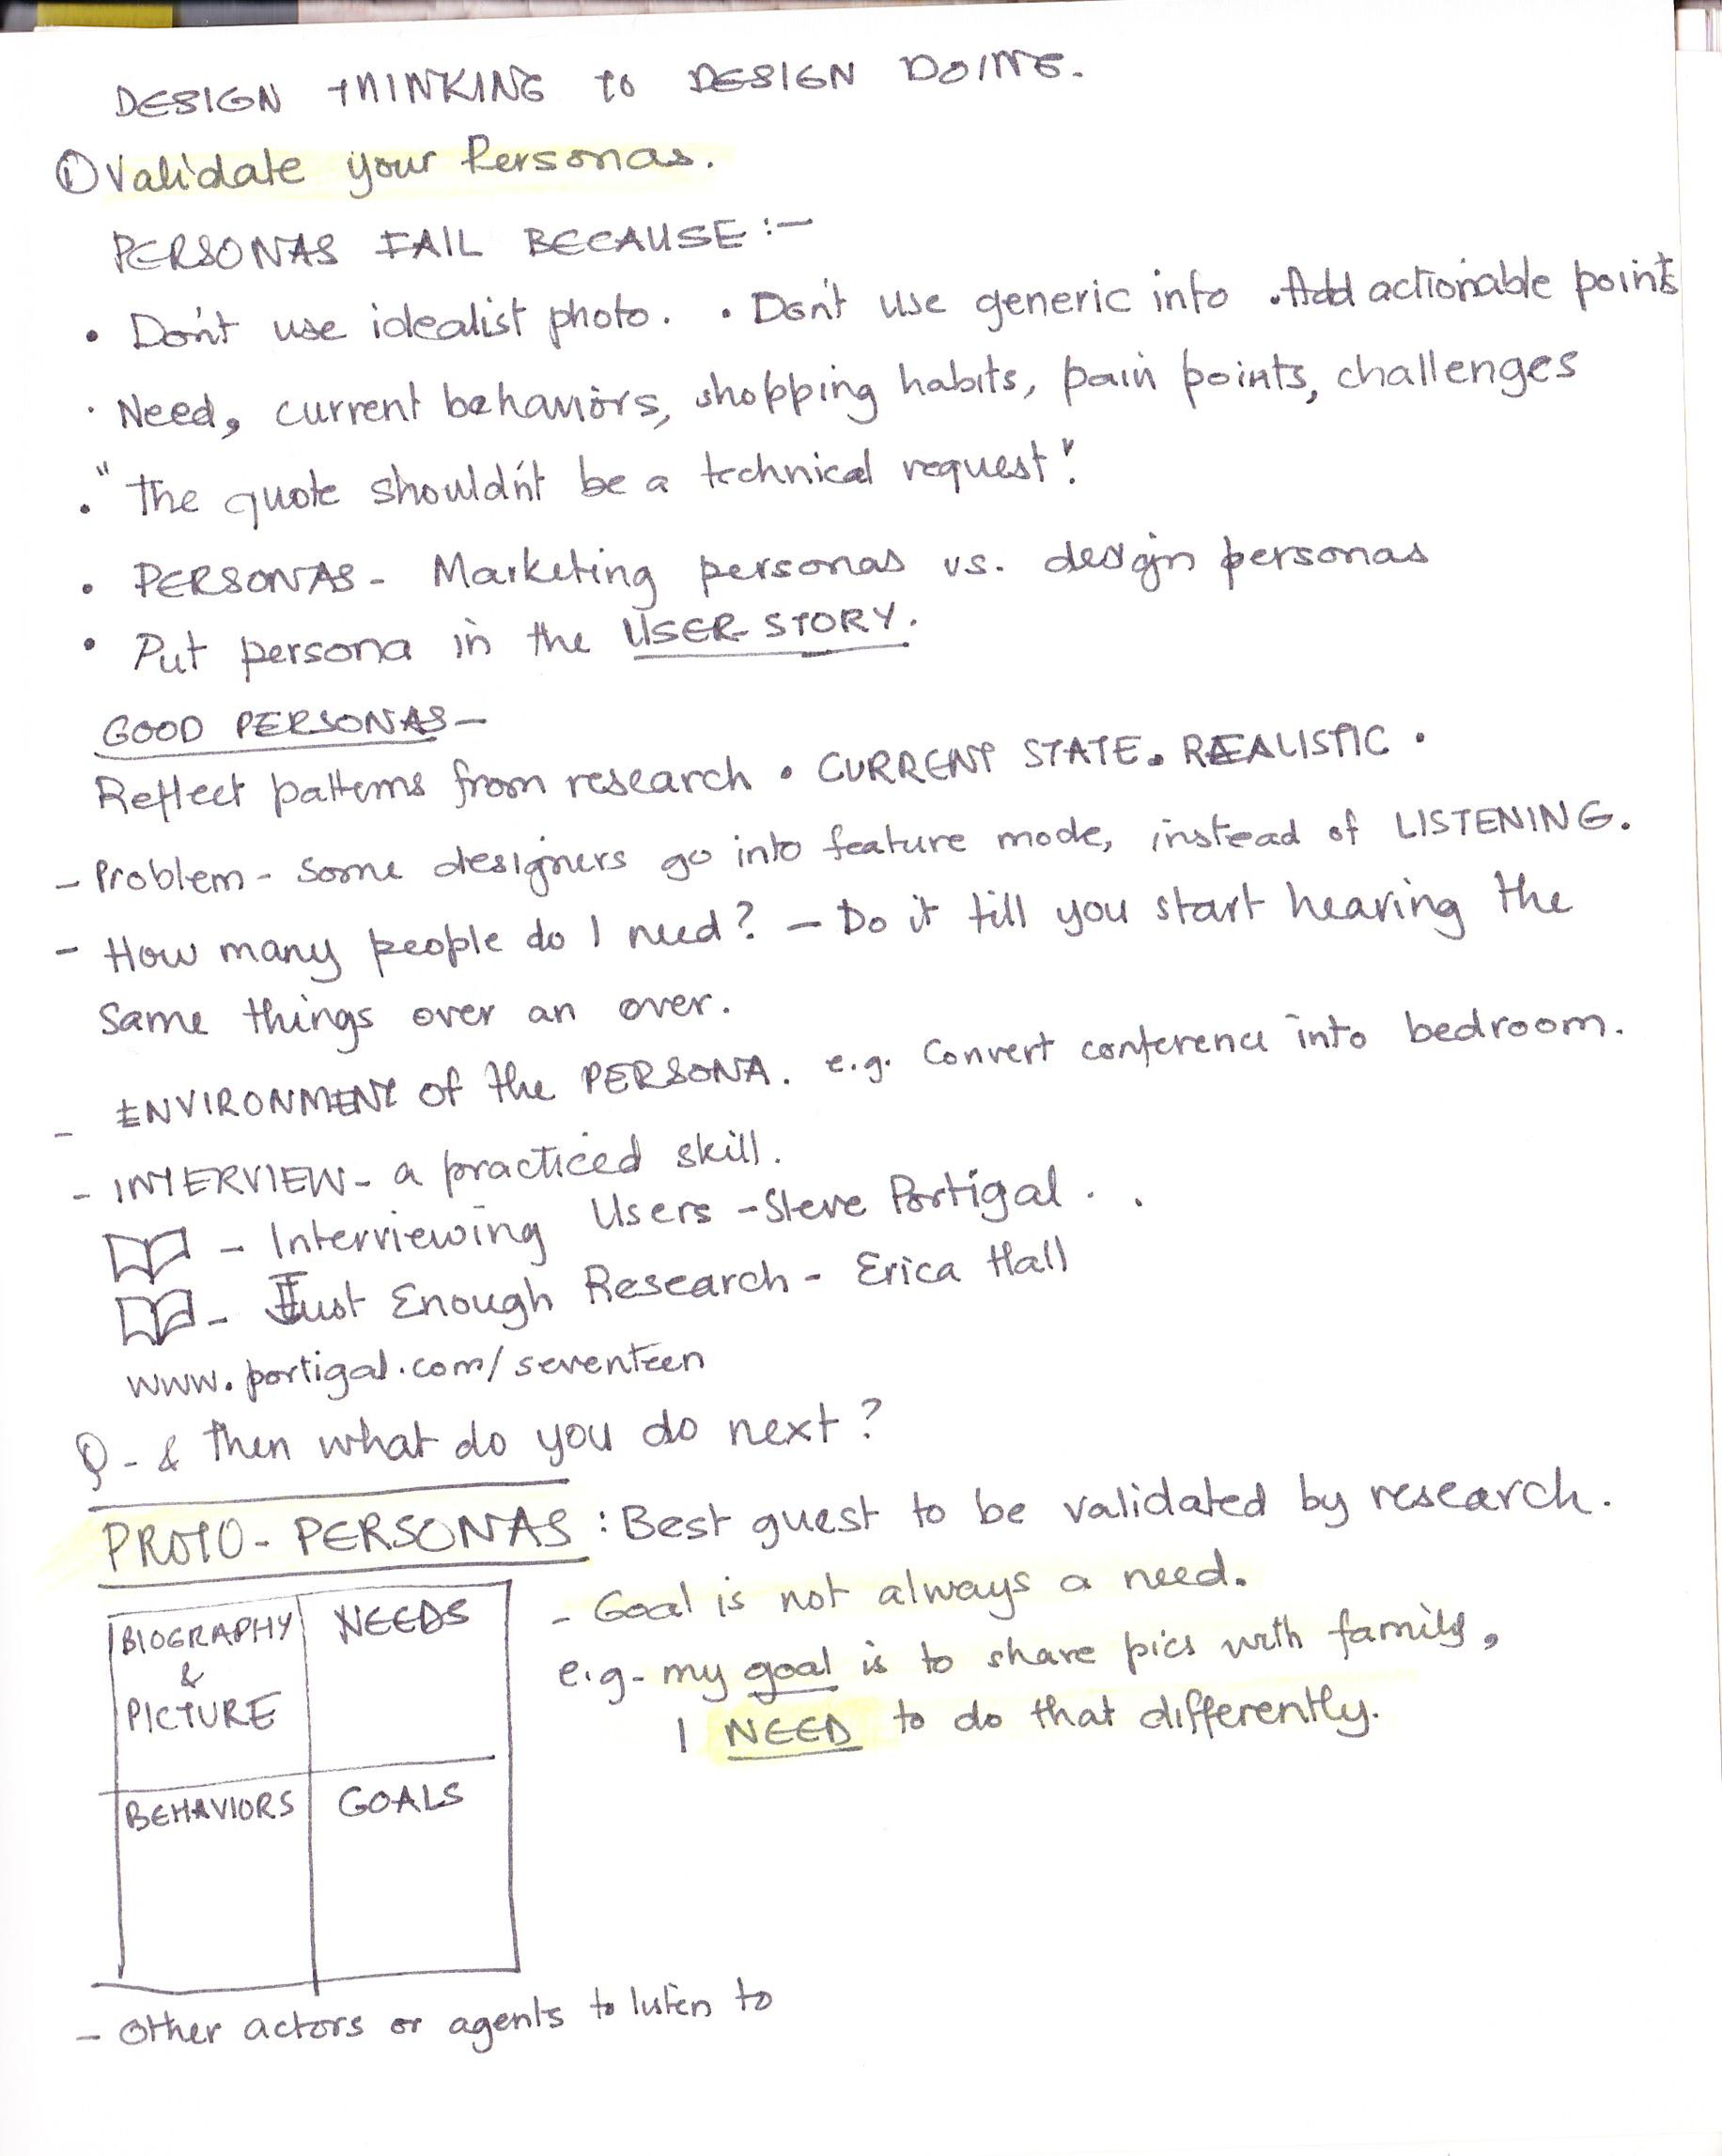 designthink-doing-1